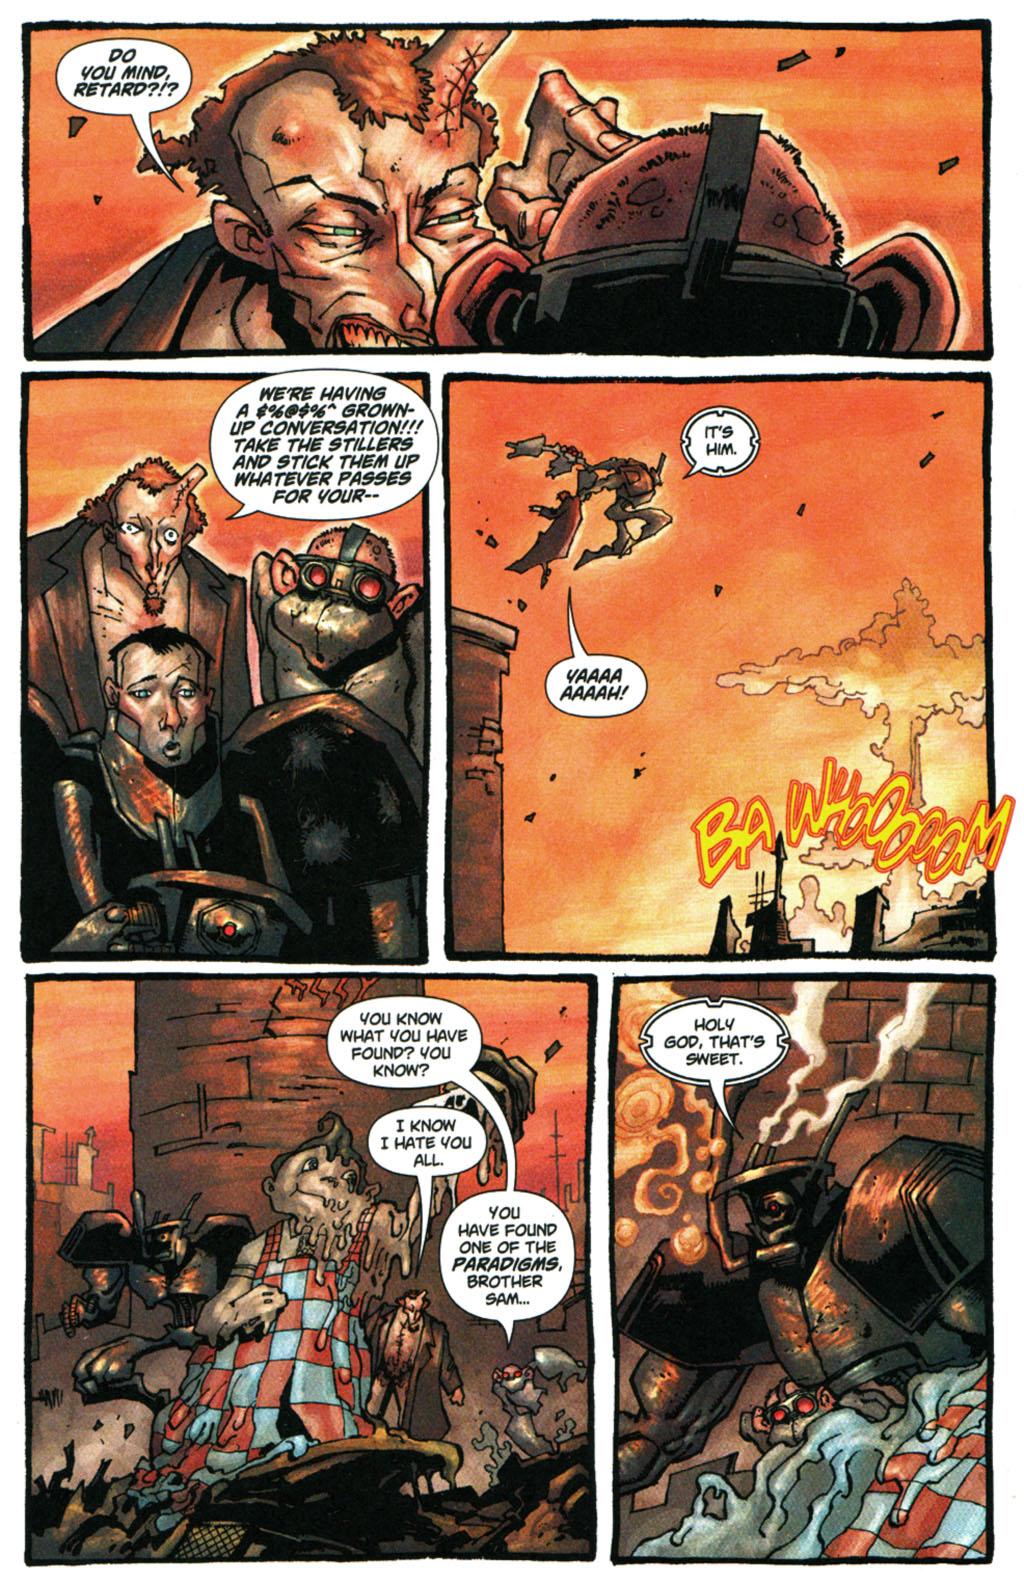 Read online Enginehead comic -  Issue #5 - 11